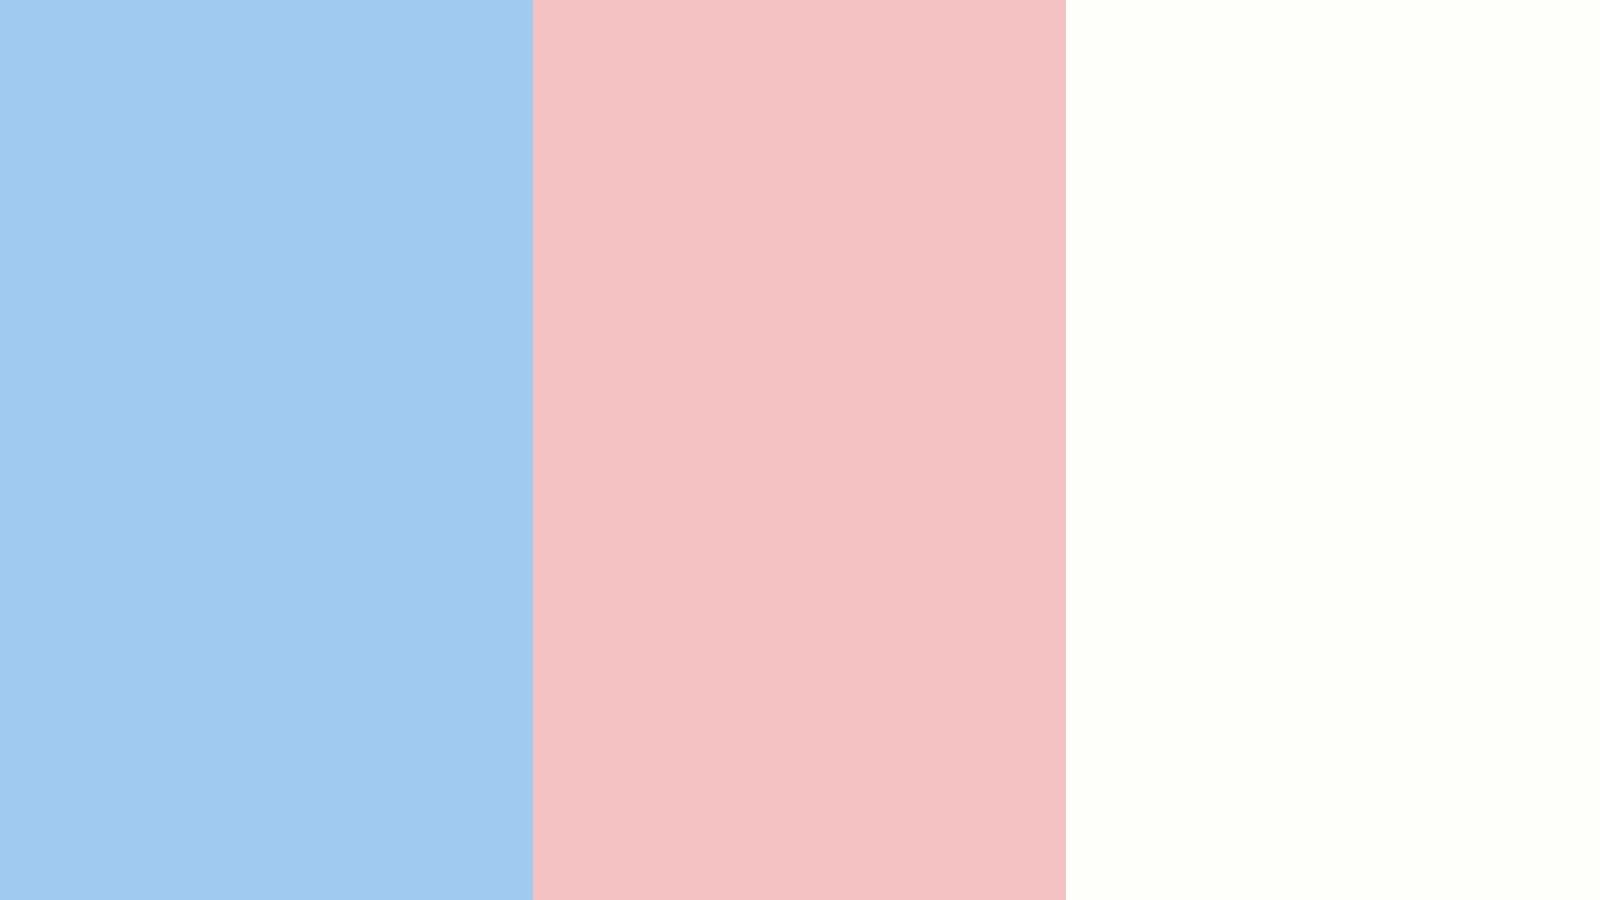 Pink and blue wallpaper wallpapersafari for Baby blue wallpaper